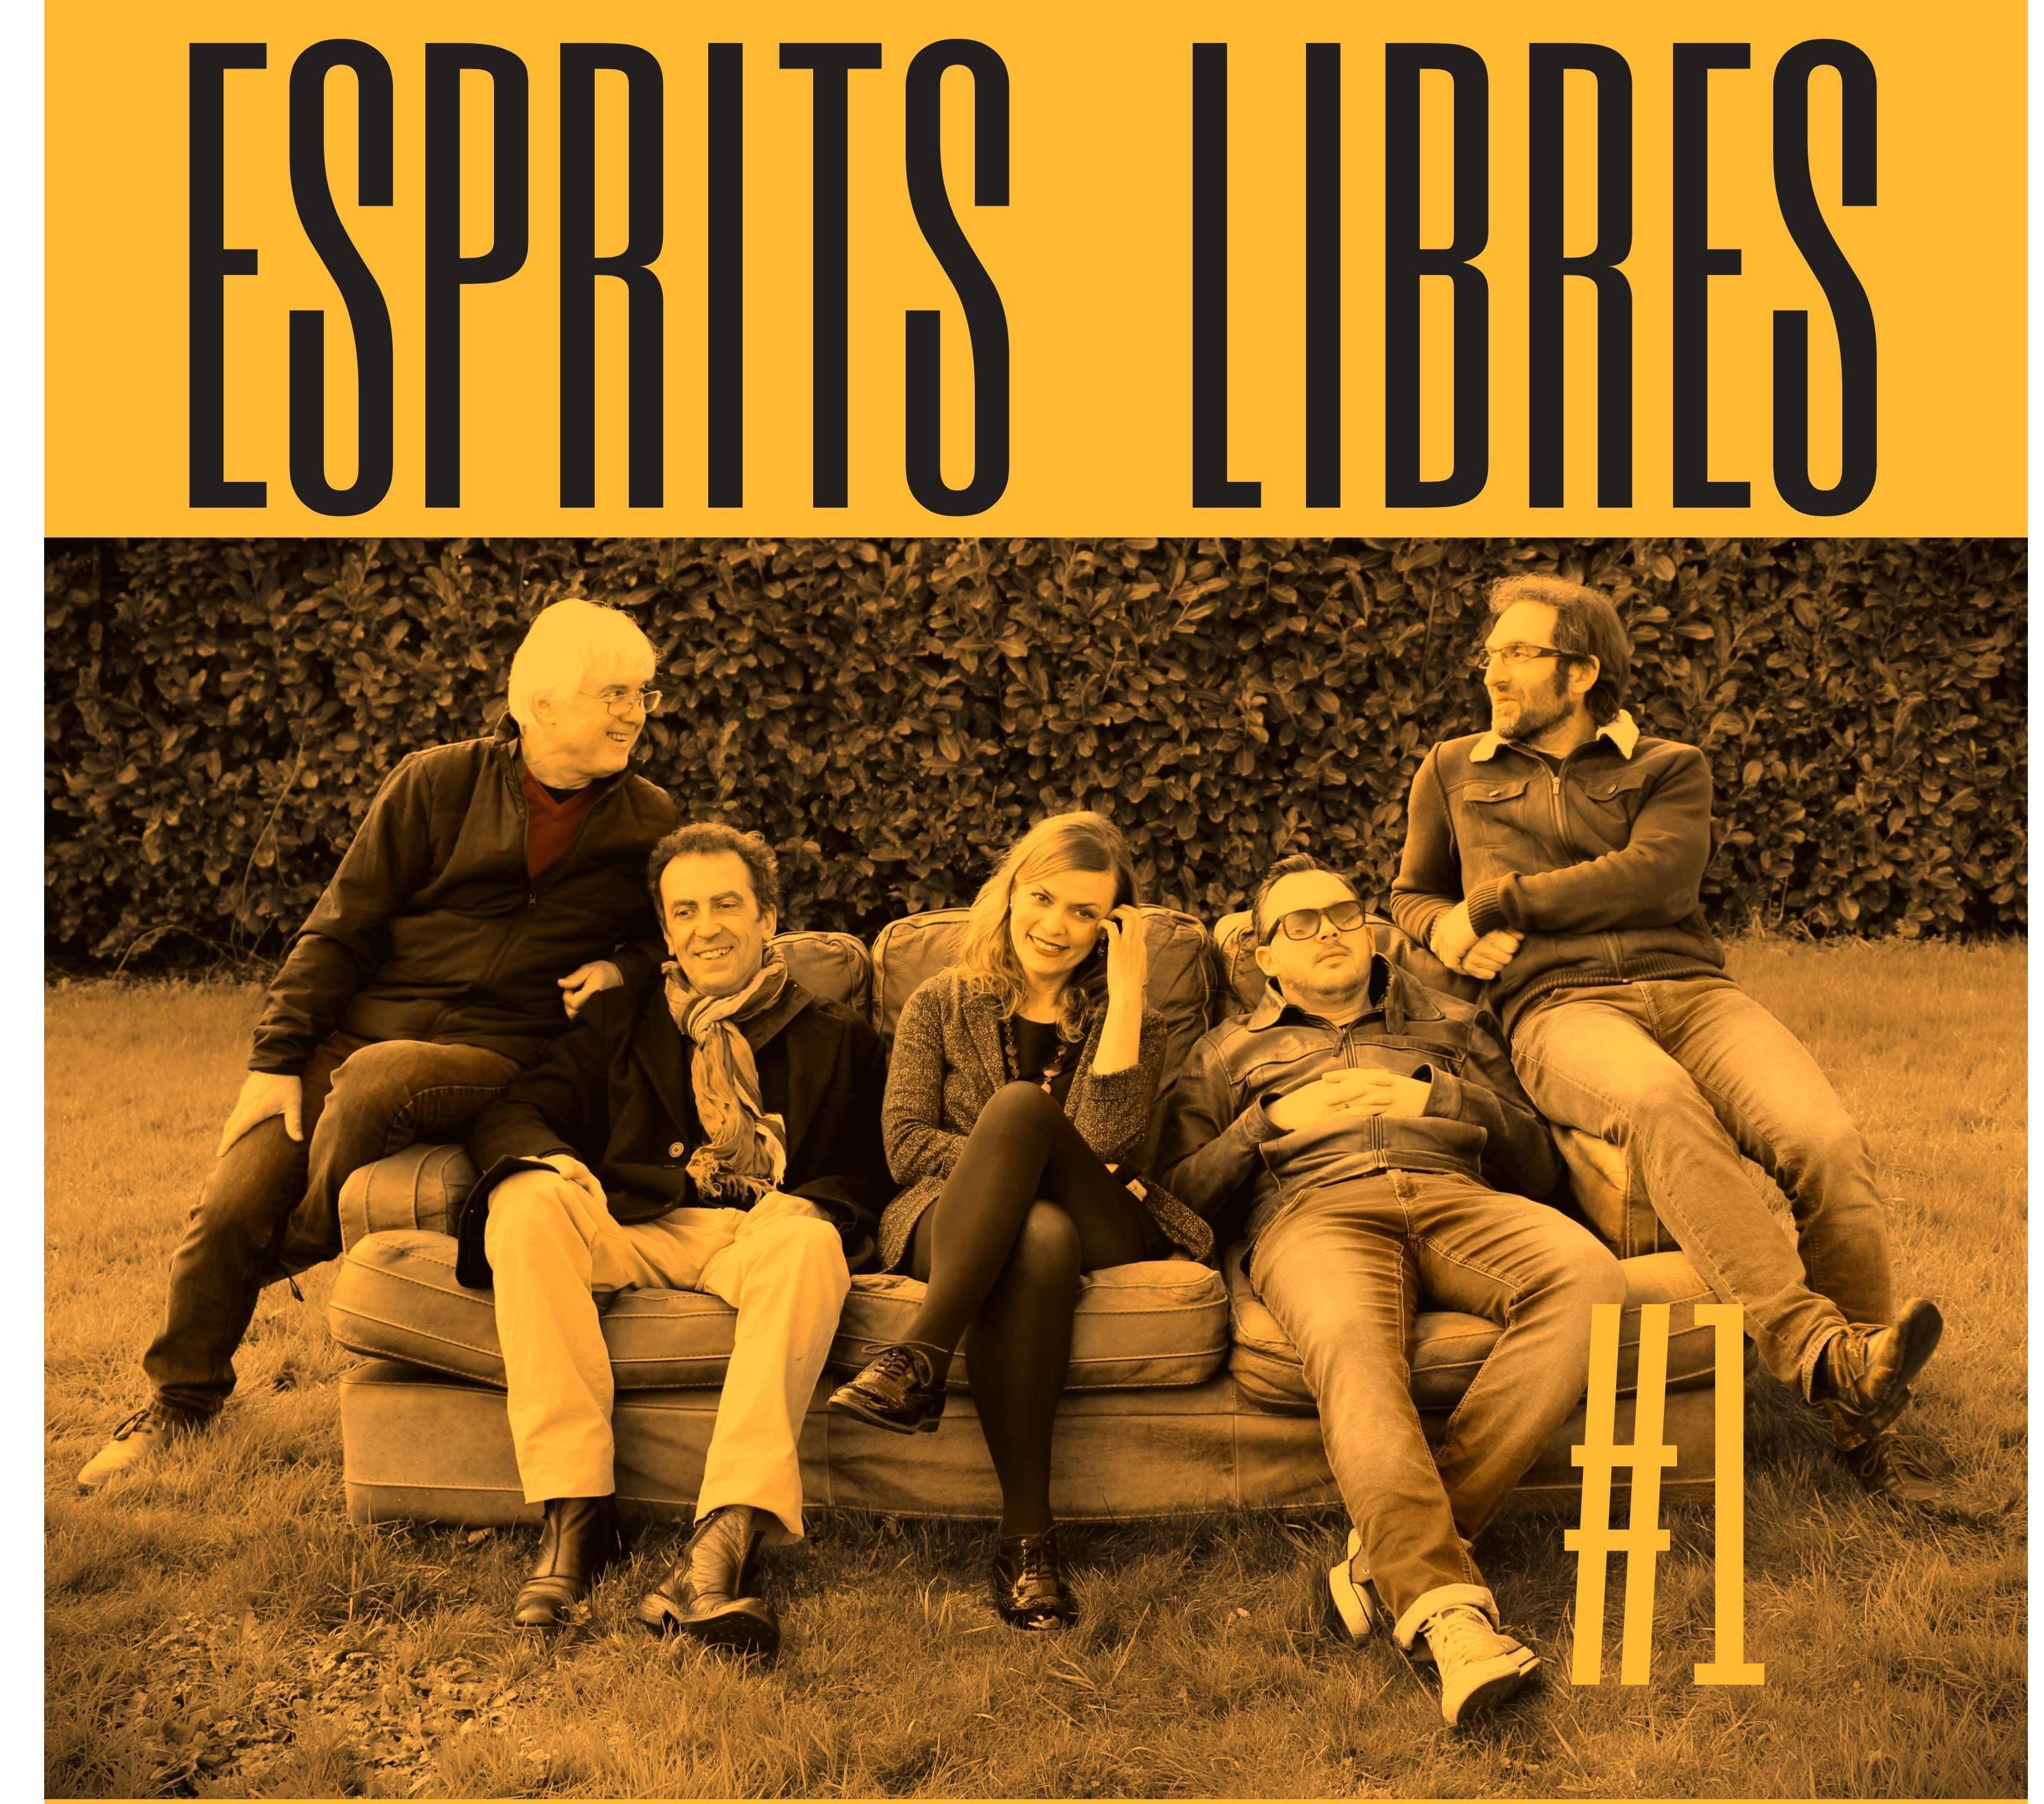 Esprits Libres - Quintet Jazz avec chanteuse